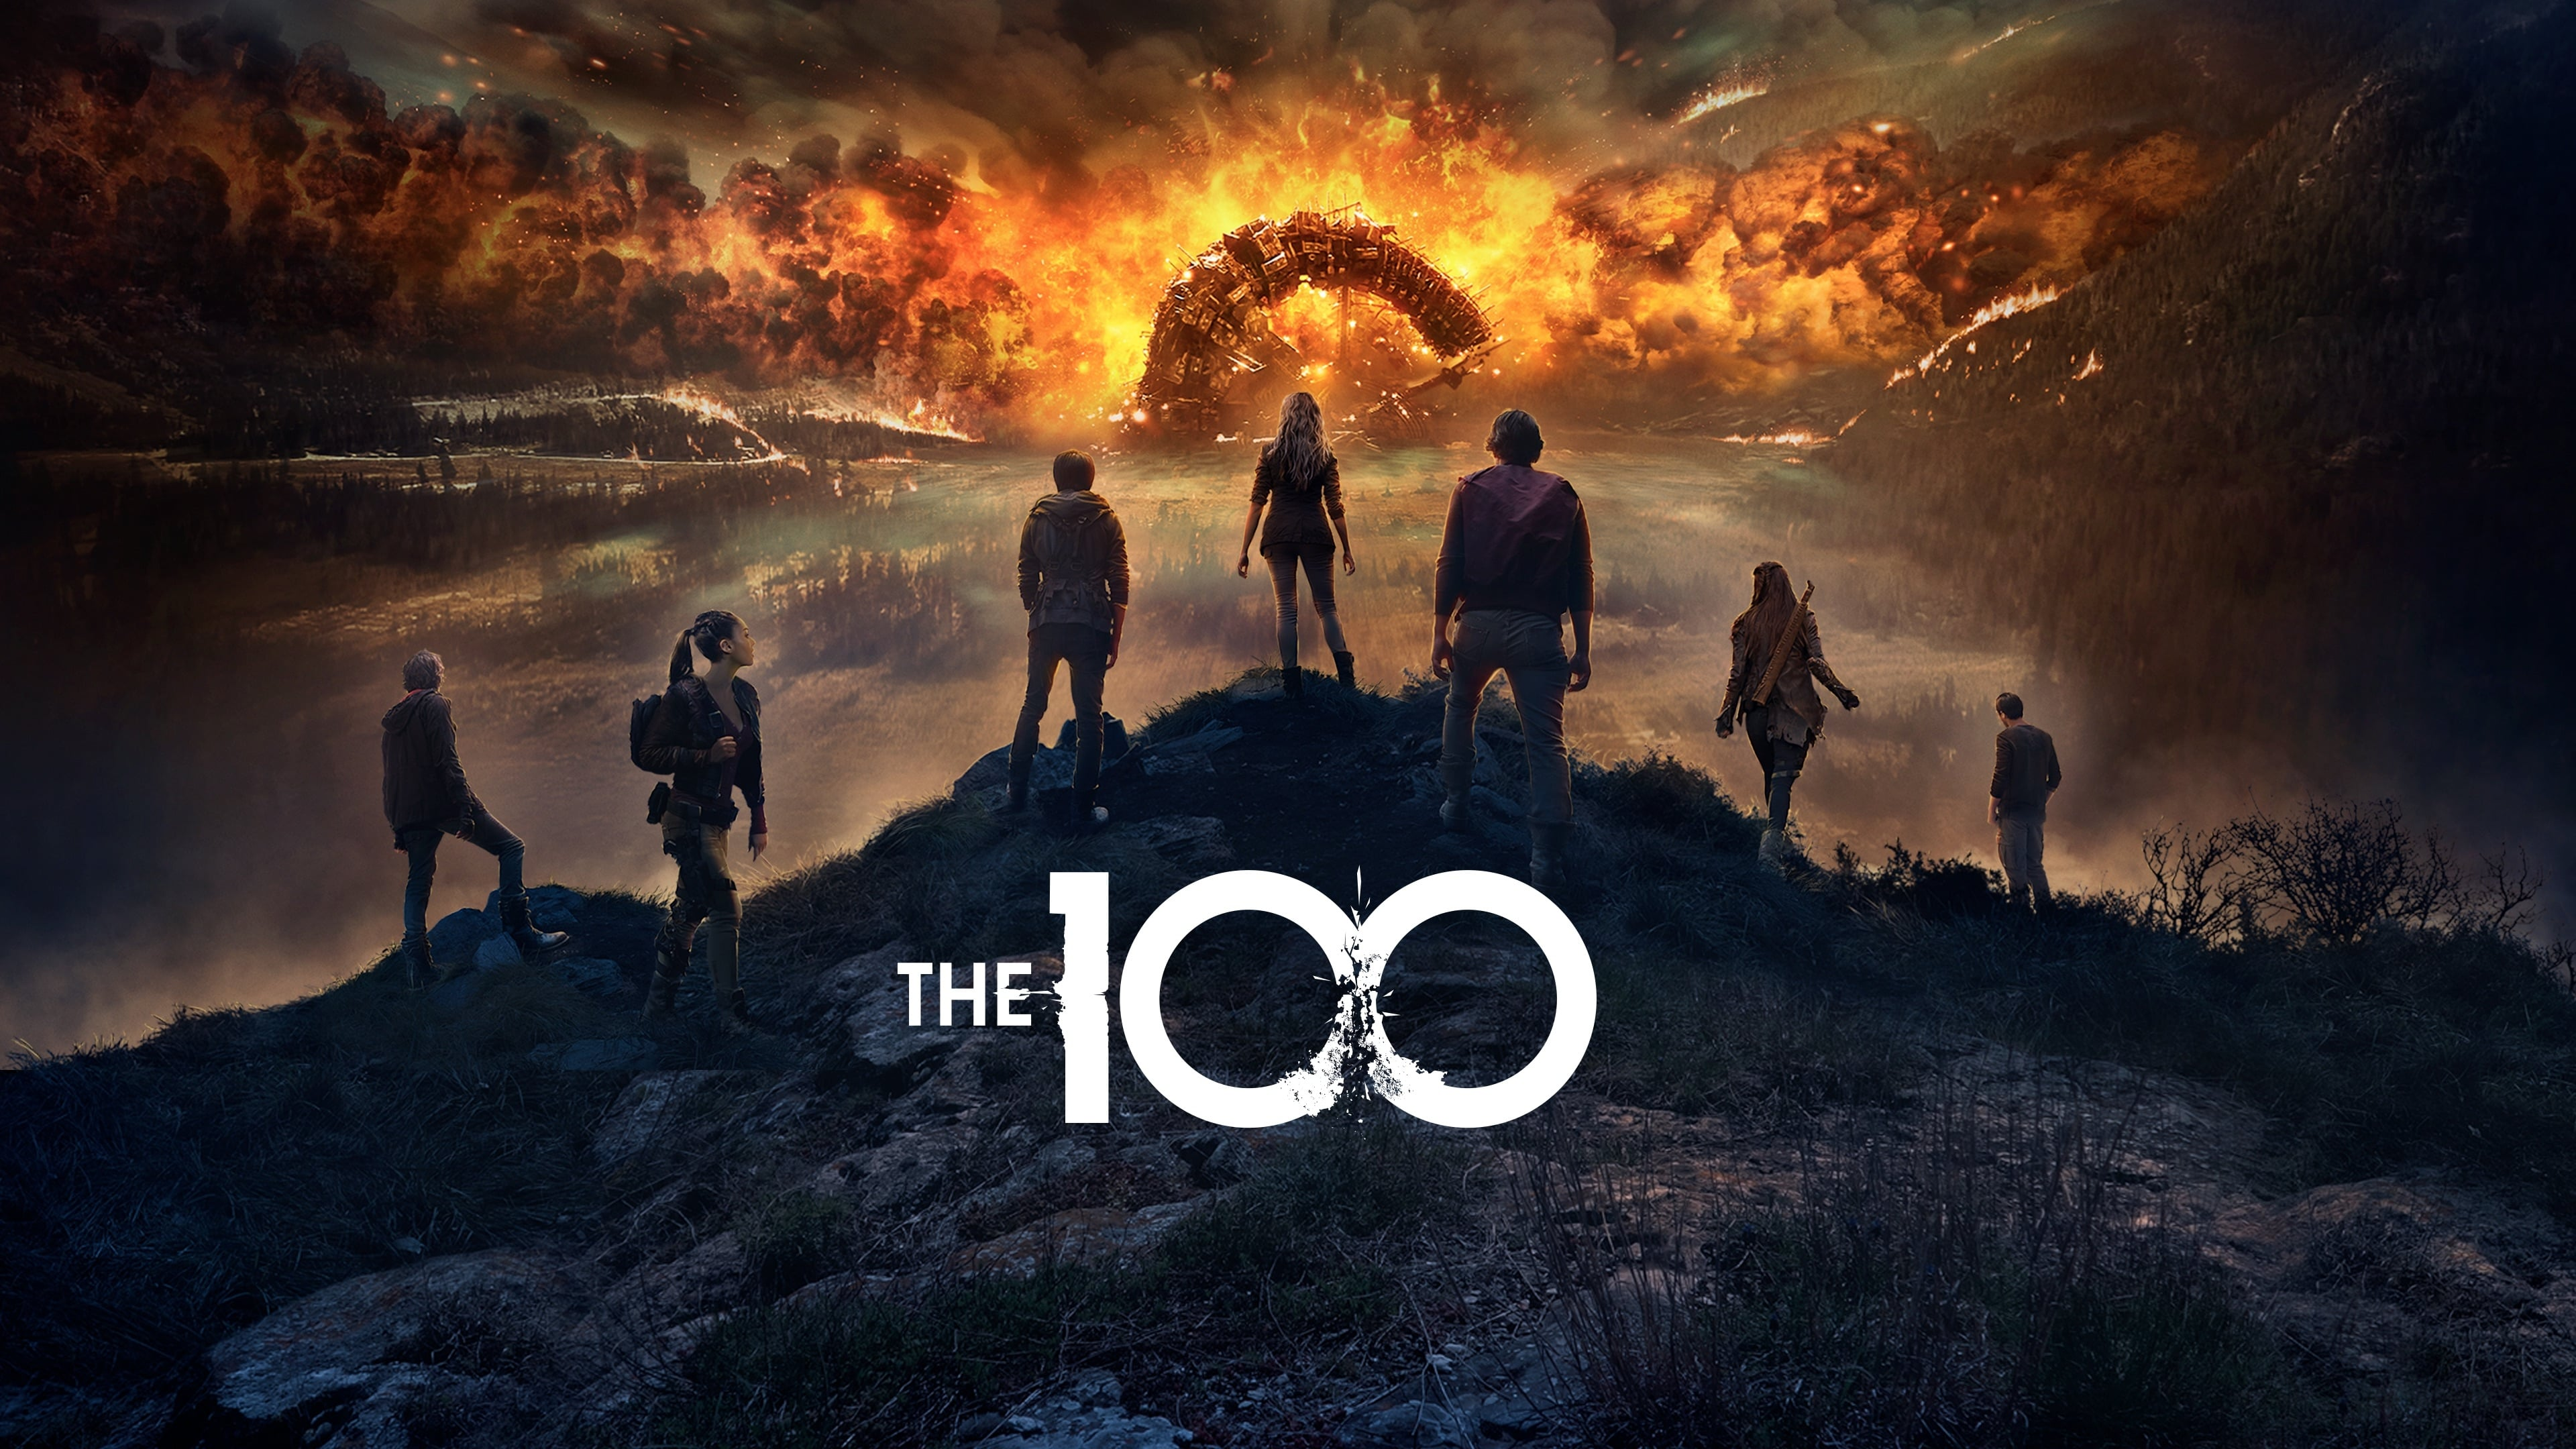 The 100 - Season 5